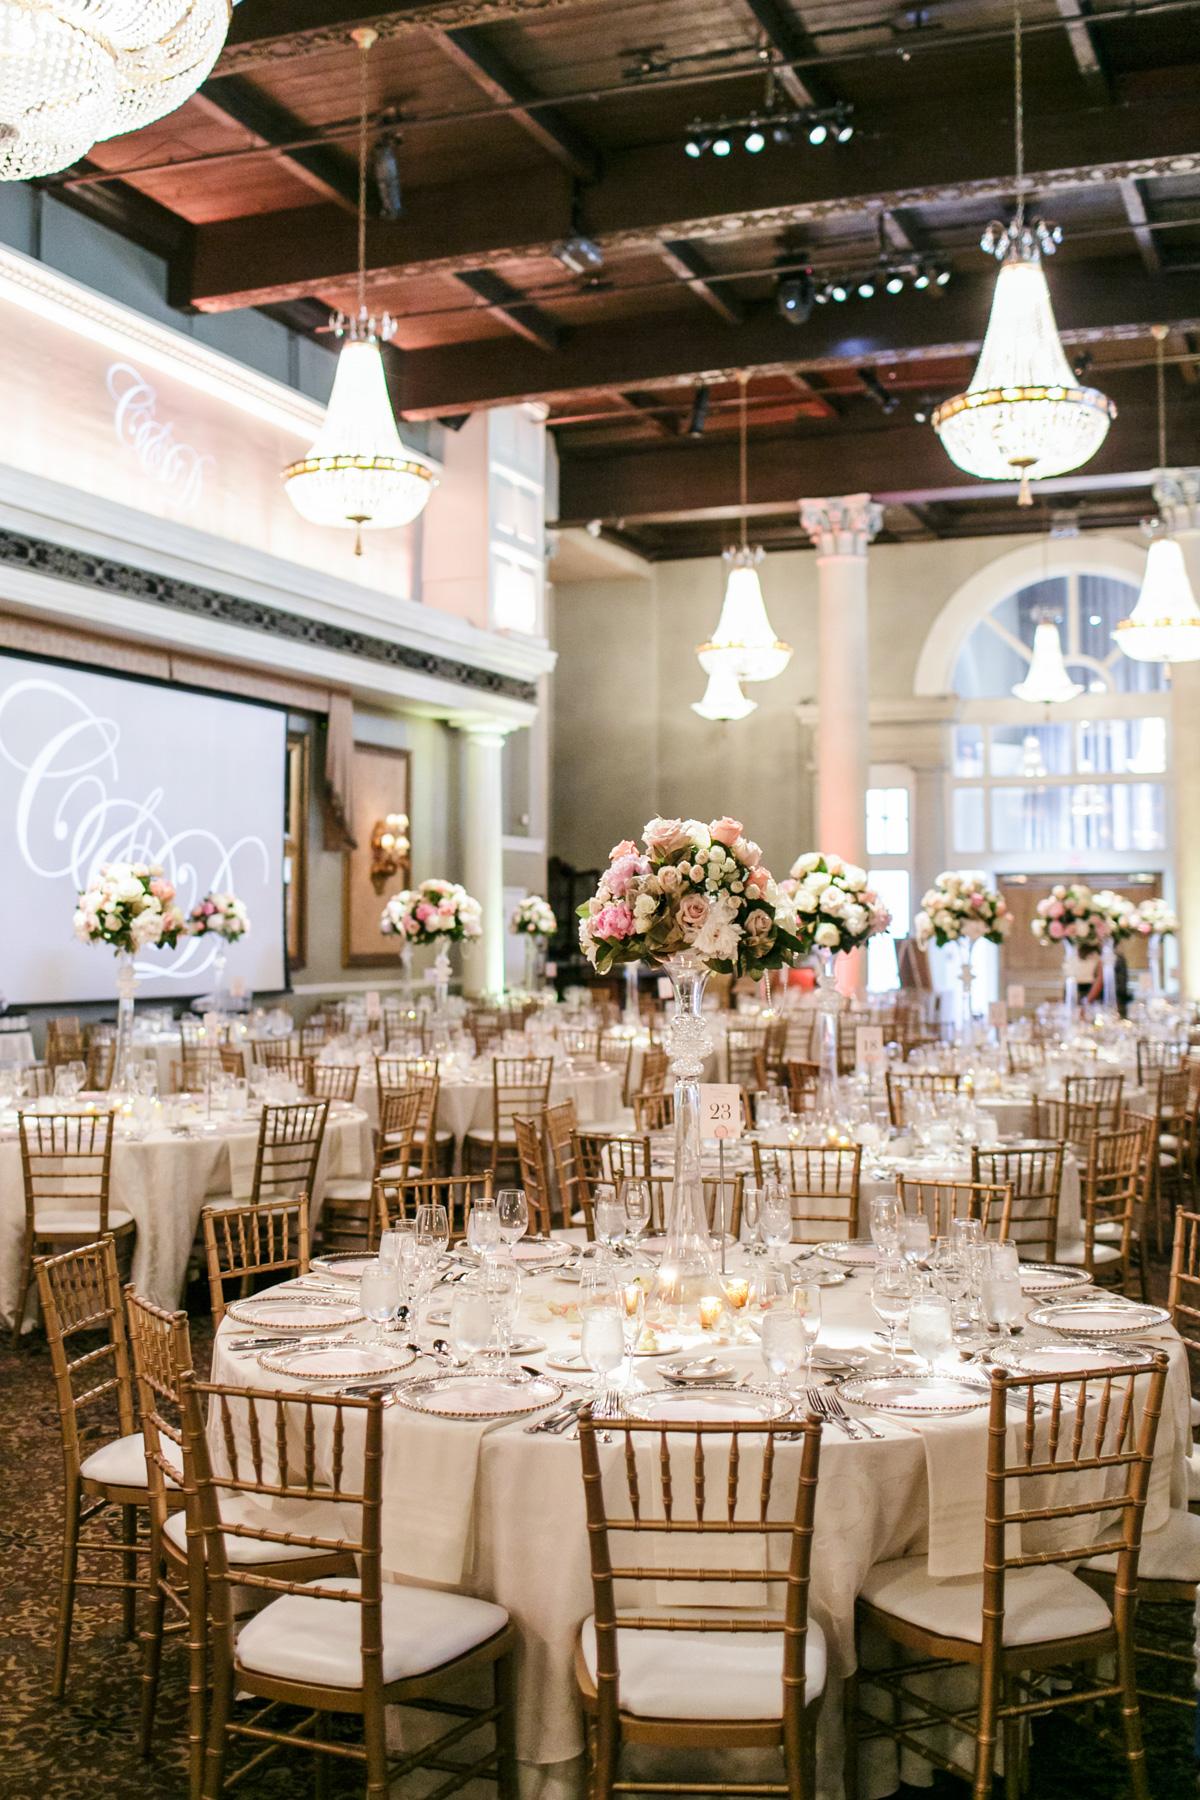 joeewong-chdi-toronto-liberty-grand-wedding-230